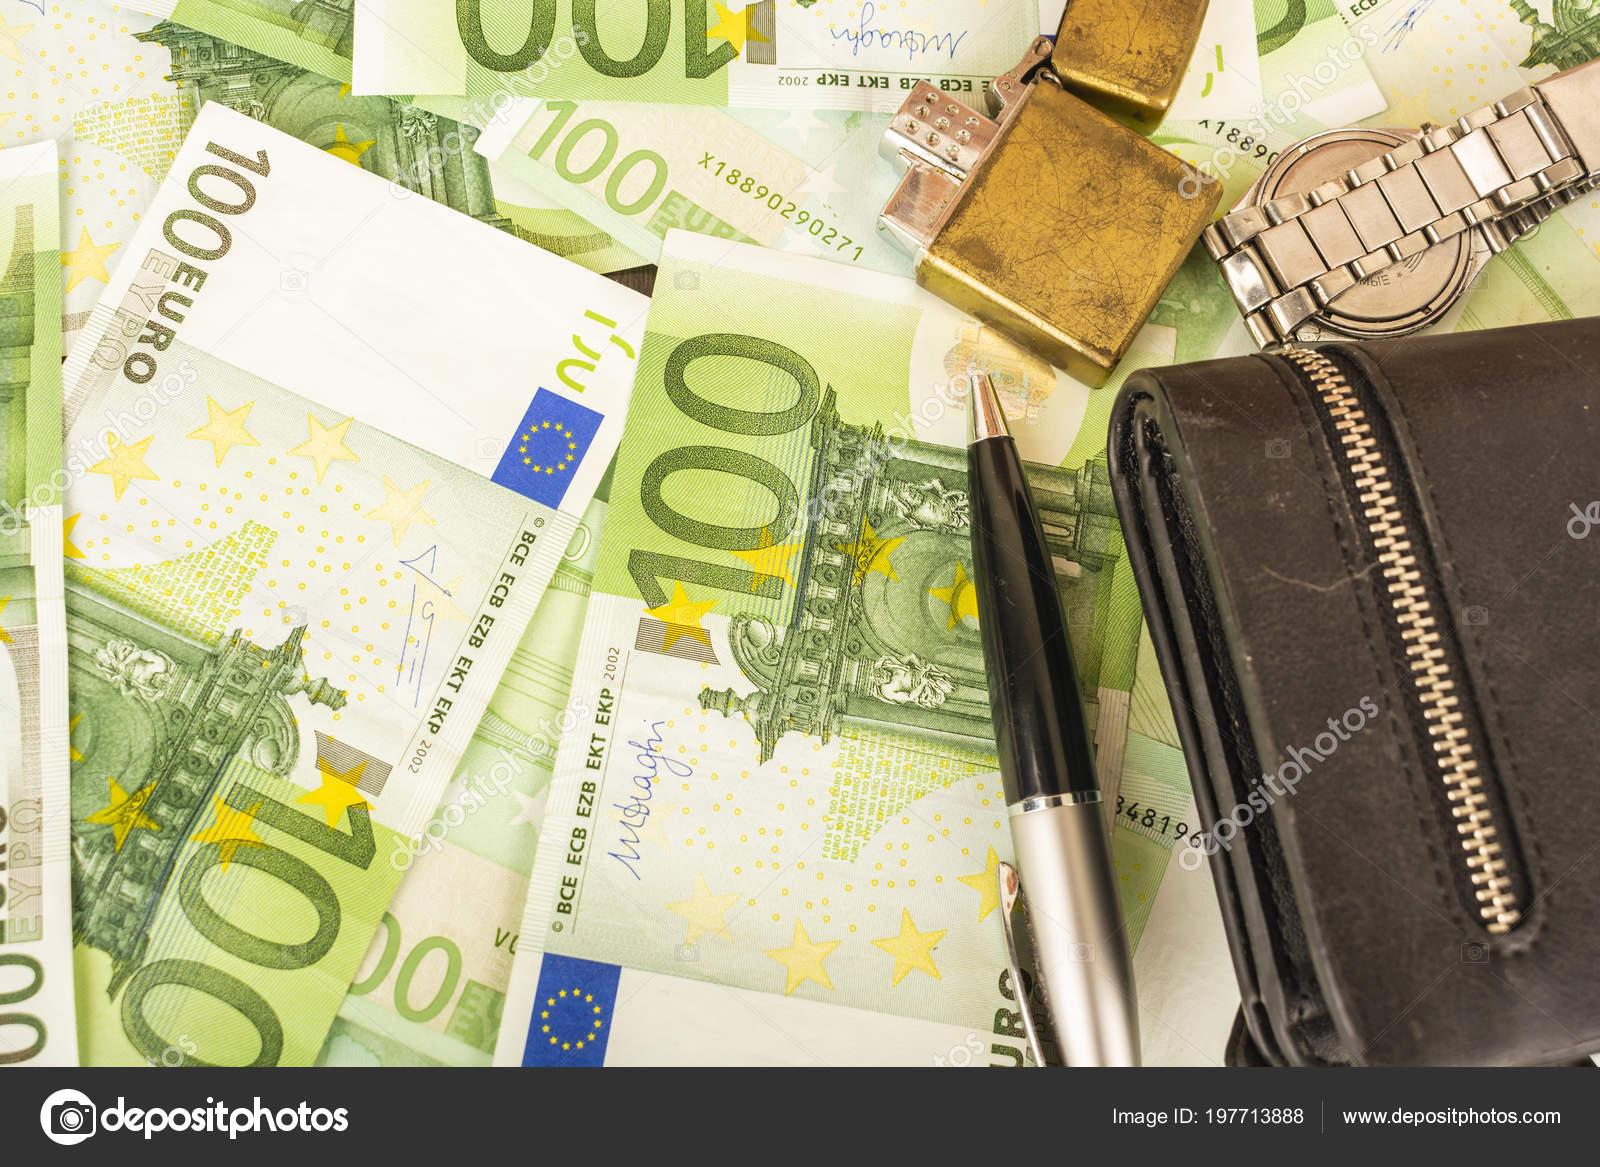 How to put money on Yandex. Purse